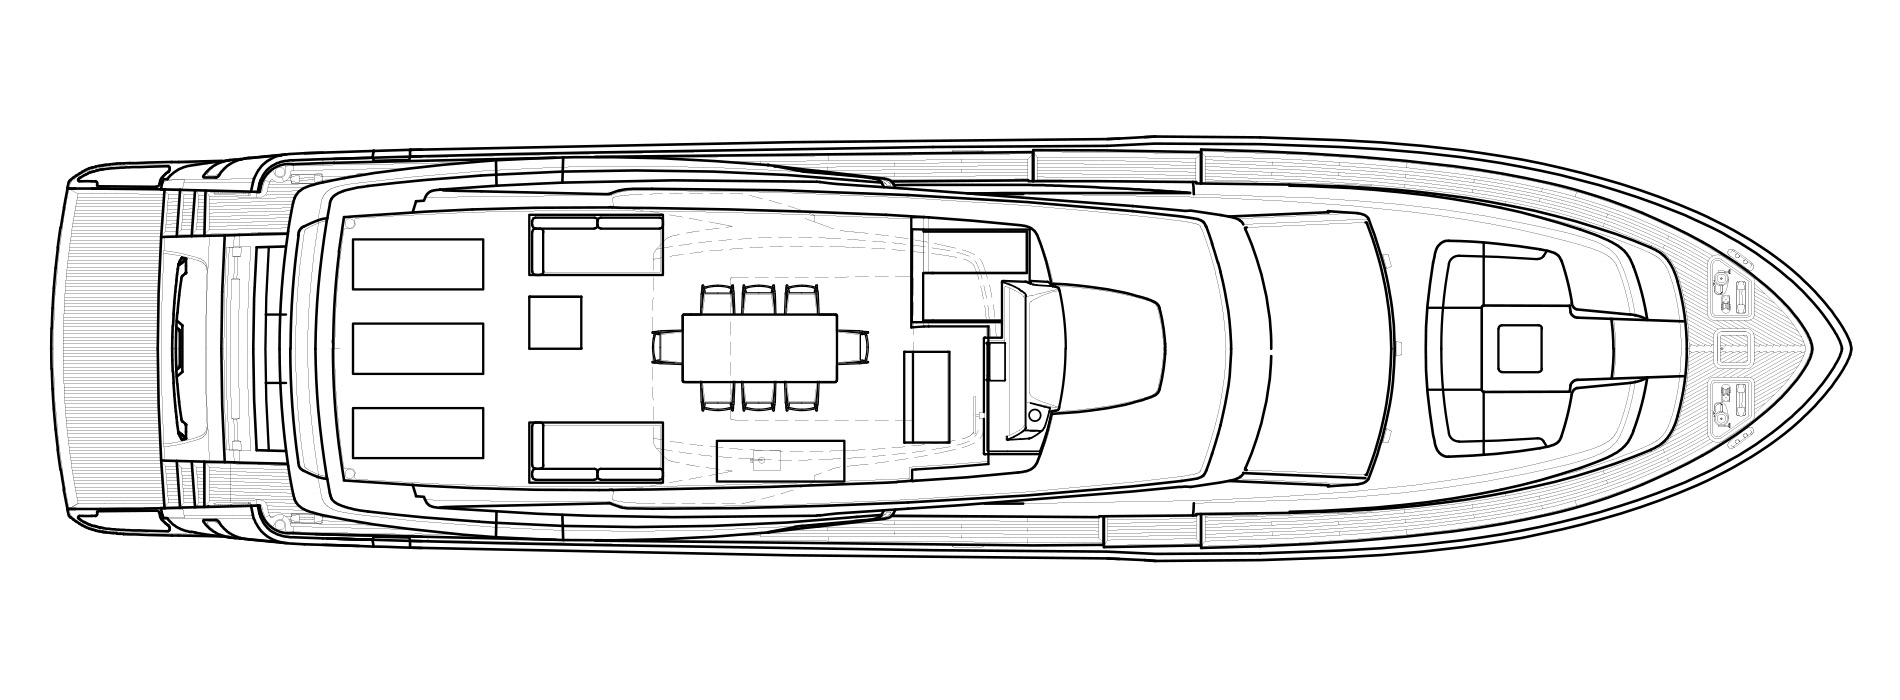 Sanlorenzo Yachts SL86 Flying bridge Version A